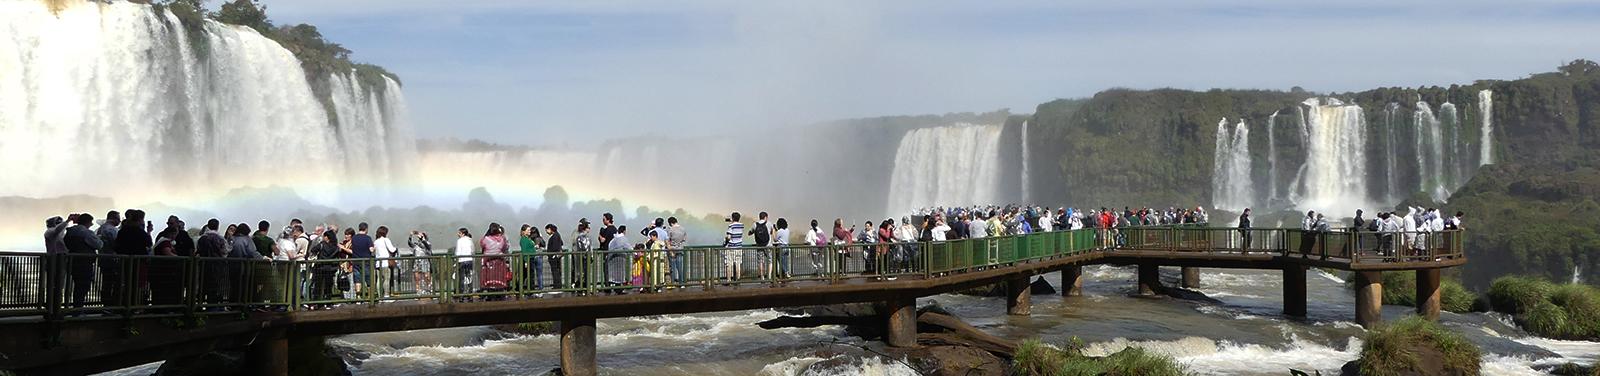 Wasserfall Iguacu, Brasilien